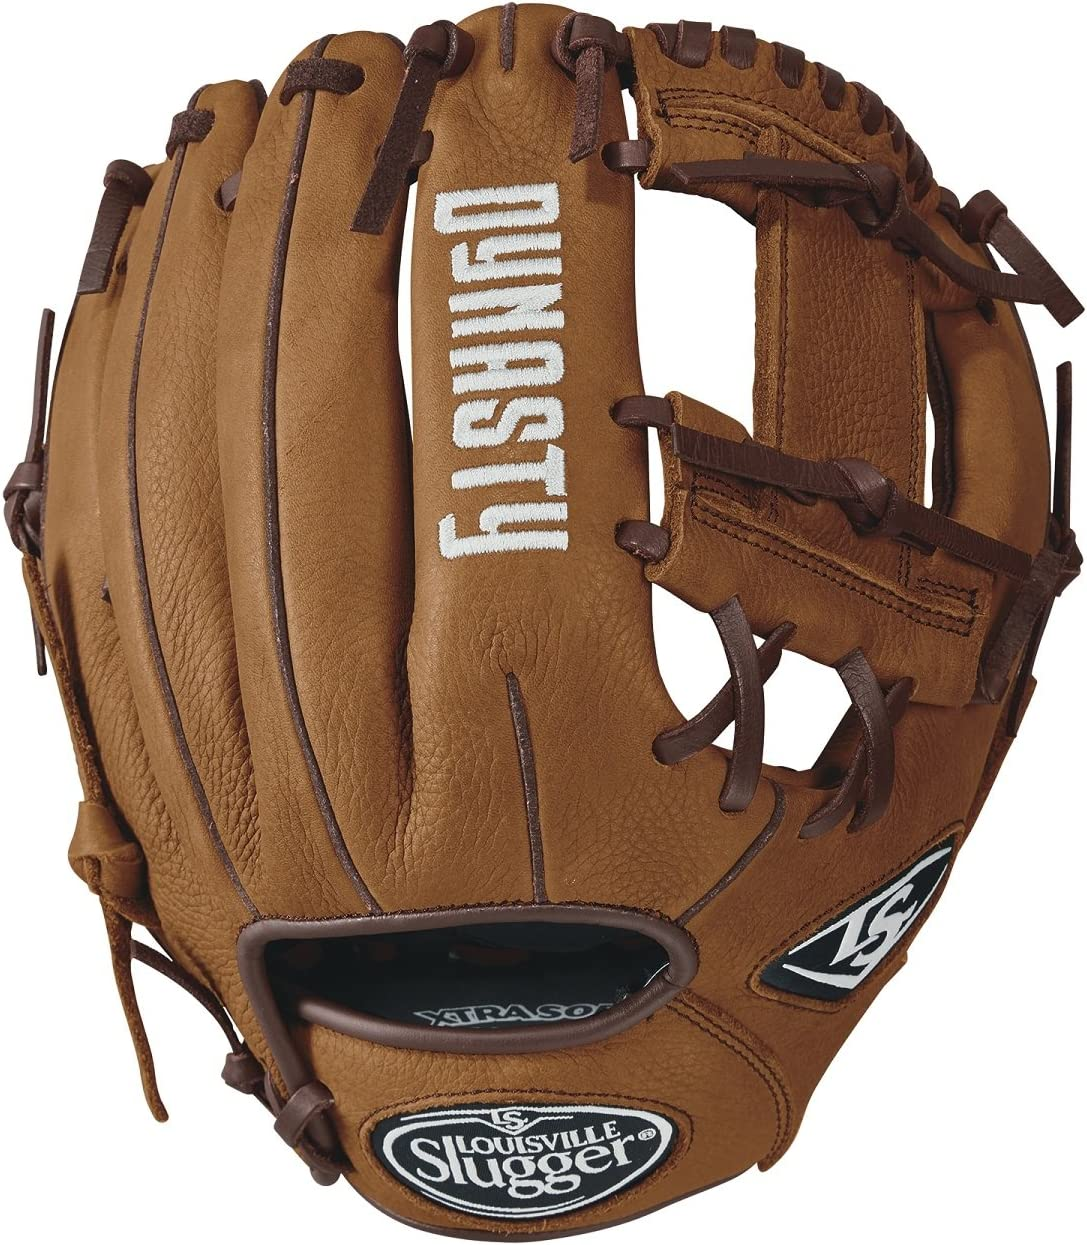 Louisville Slugger Dynasty Baseball Gloves